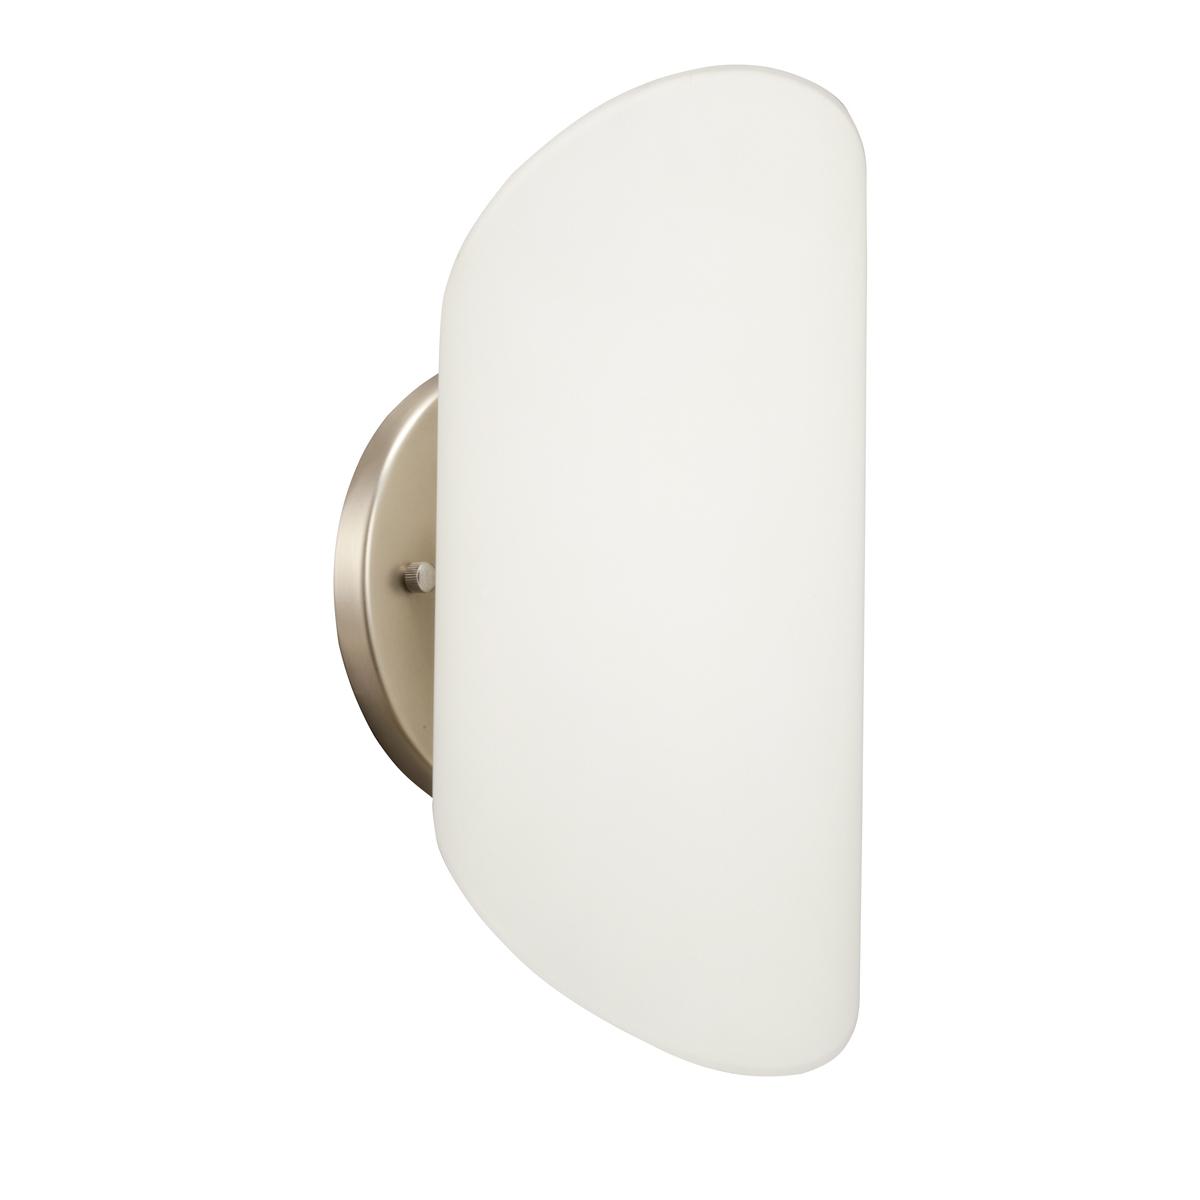 Kichler Brushed Nickel Modern Single Light Ambient Lighting Wall Sconce Brushed Nickel 10669NI ...